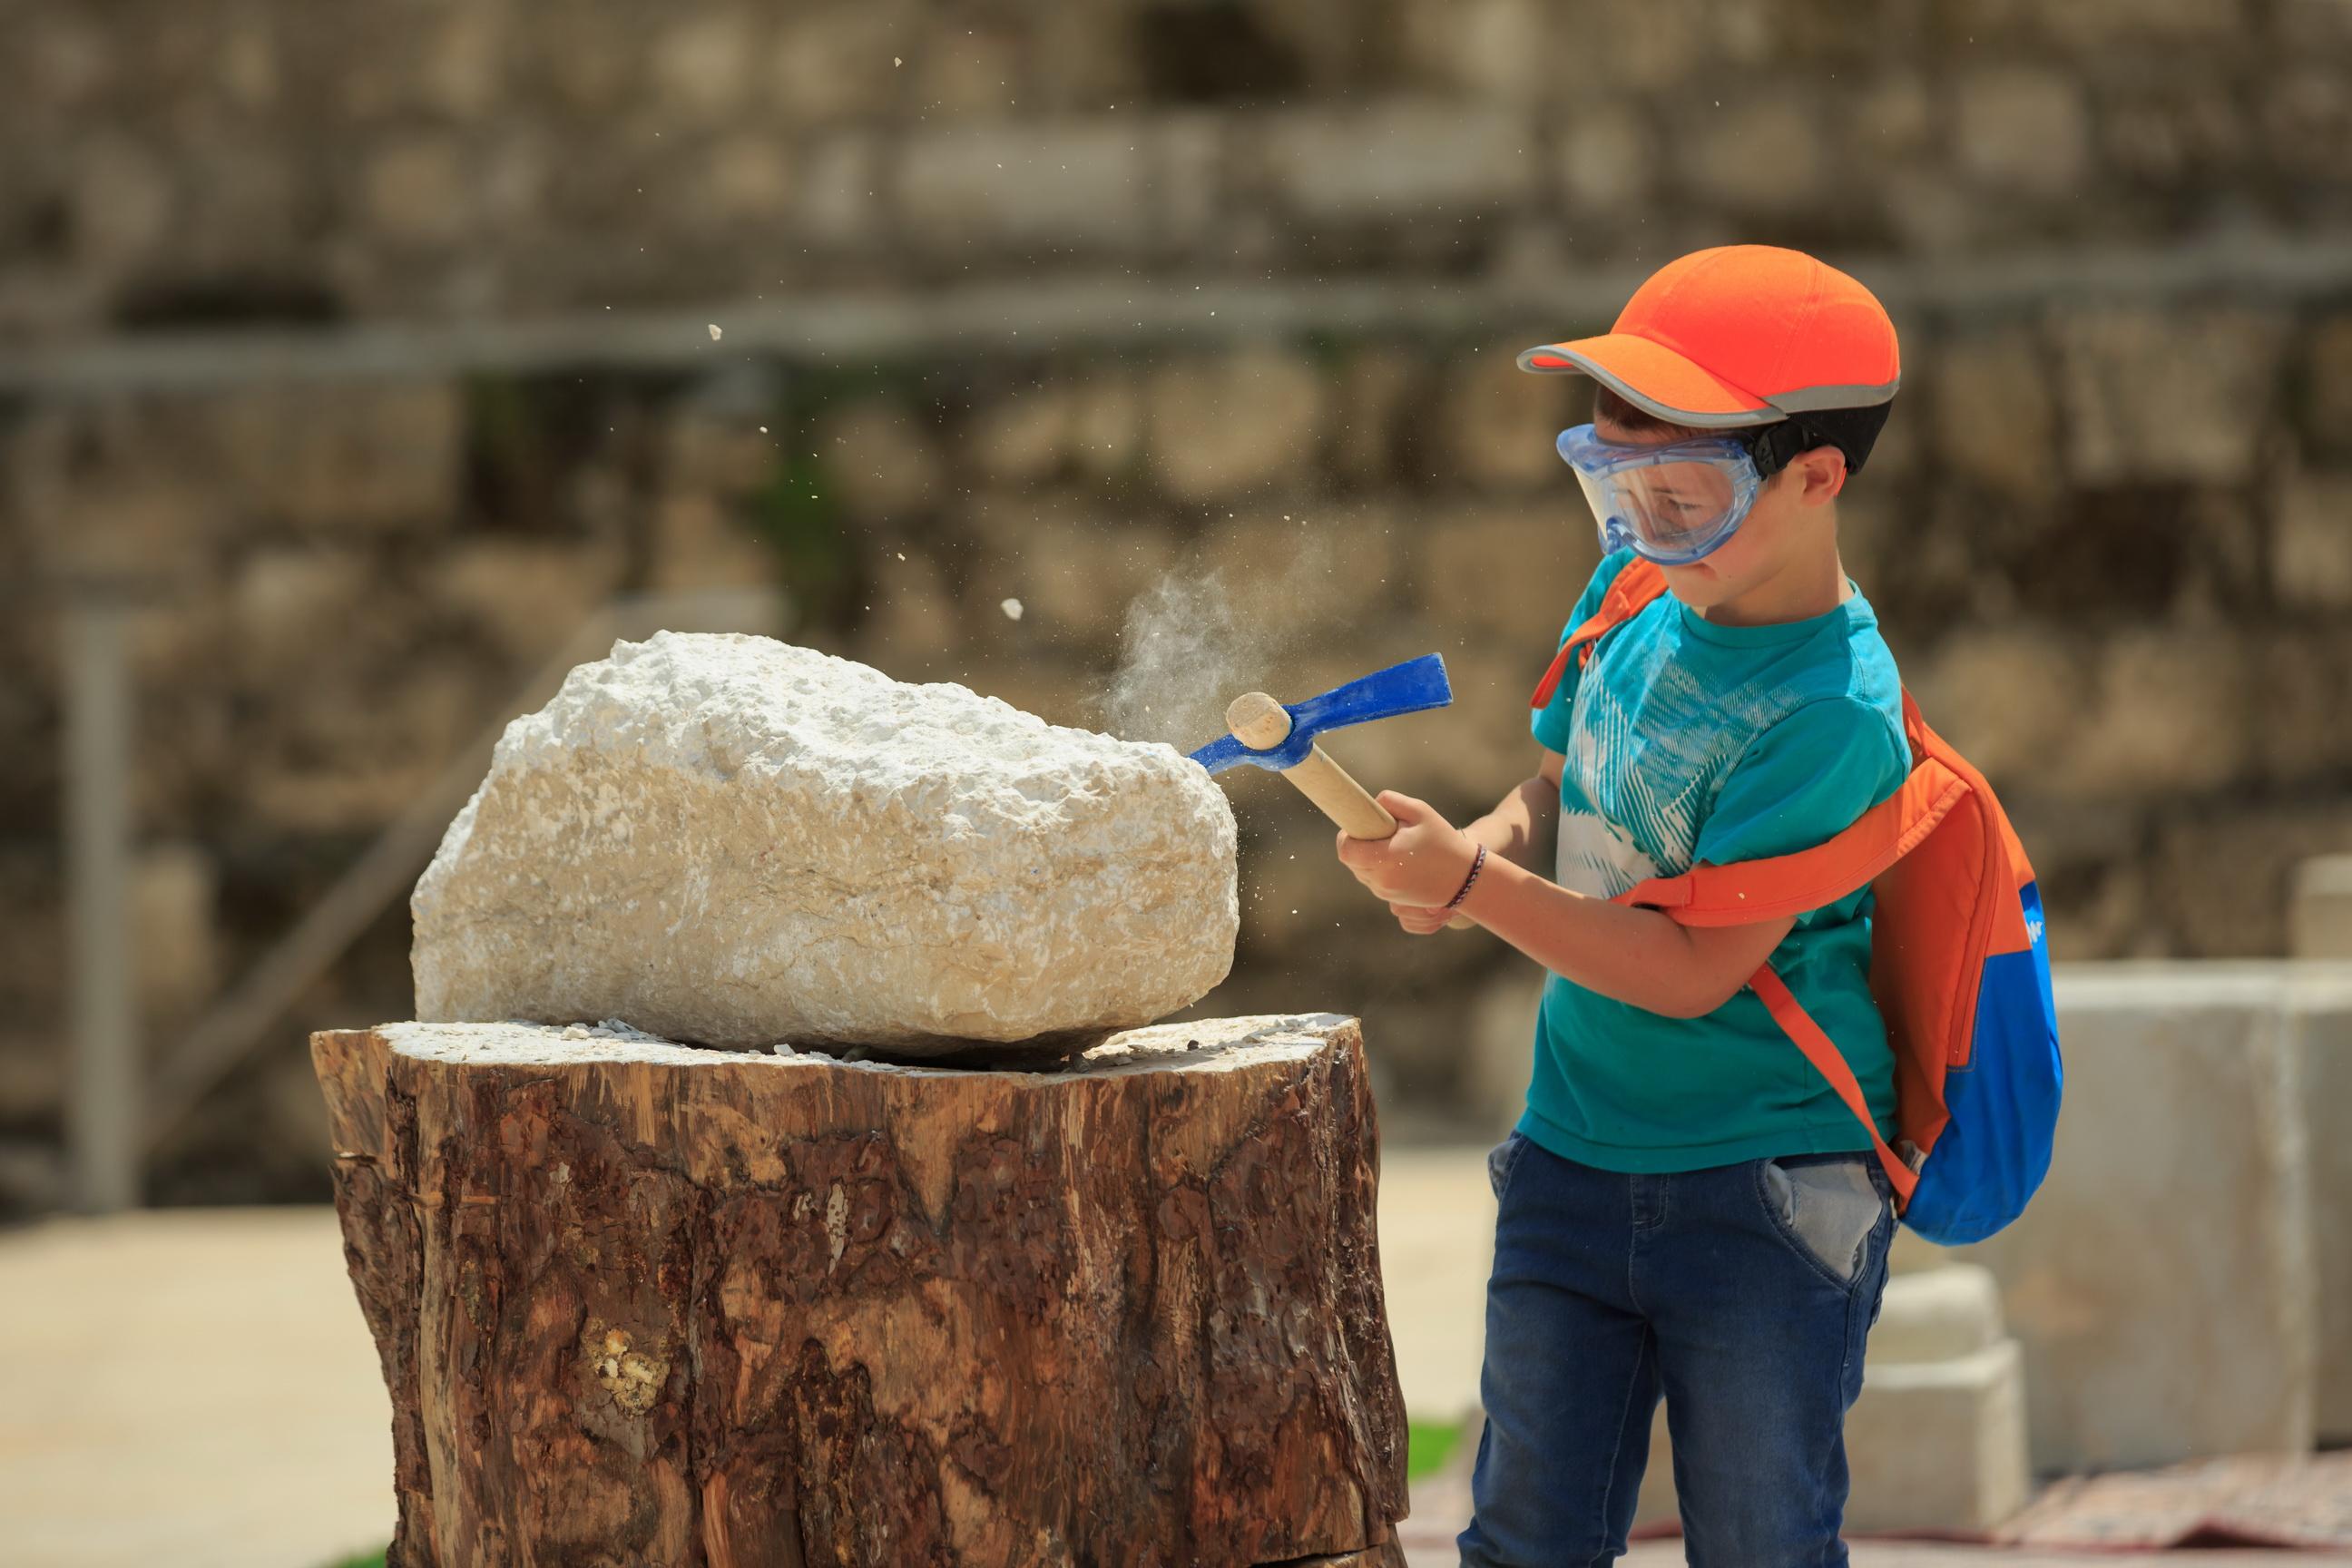 איך סיתתו אבנים- צילום אליהו ינאי